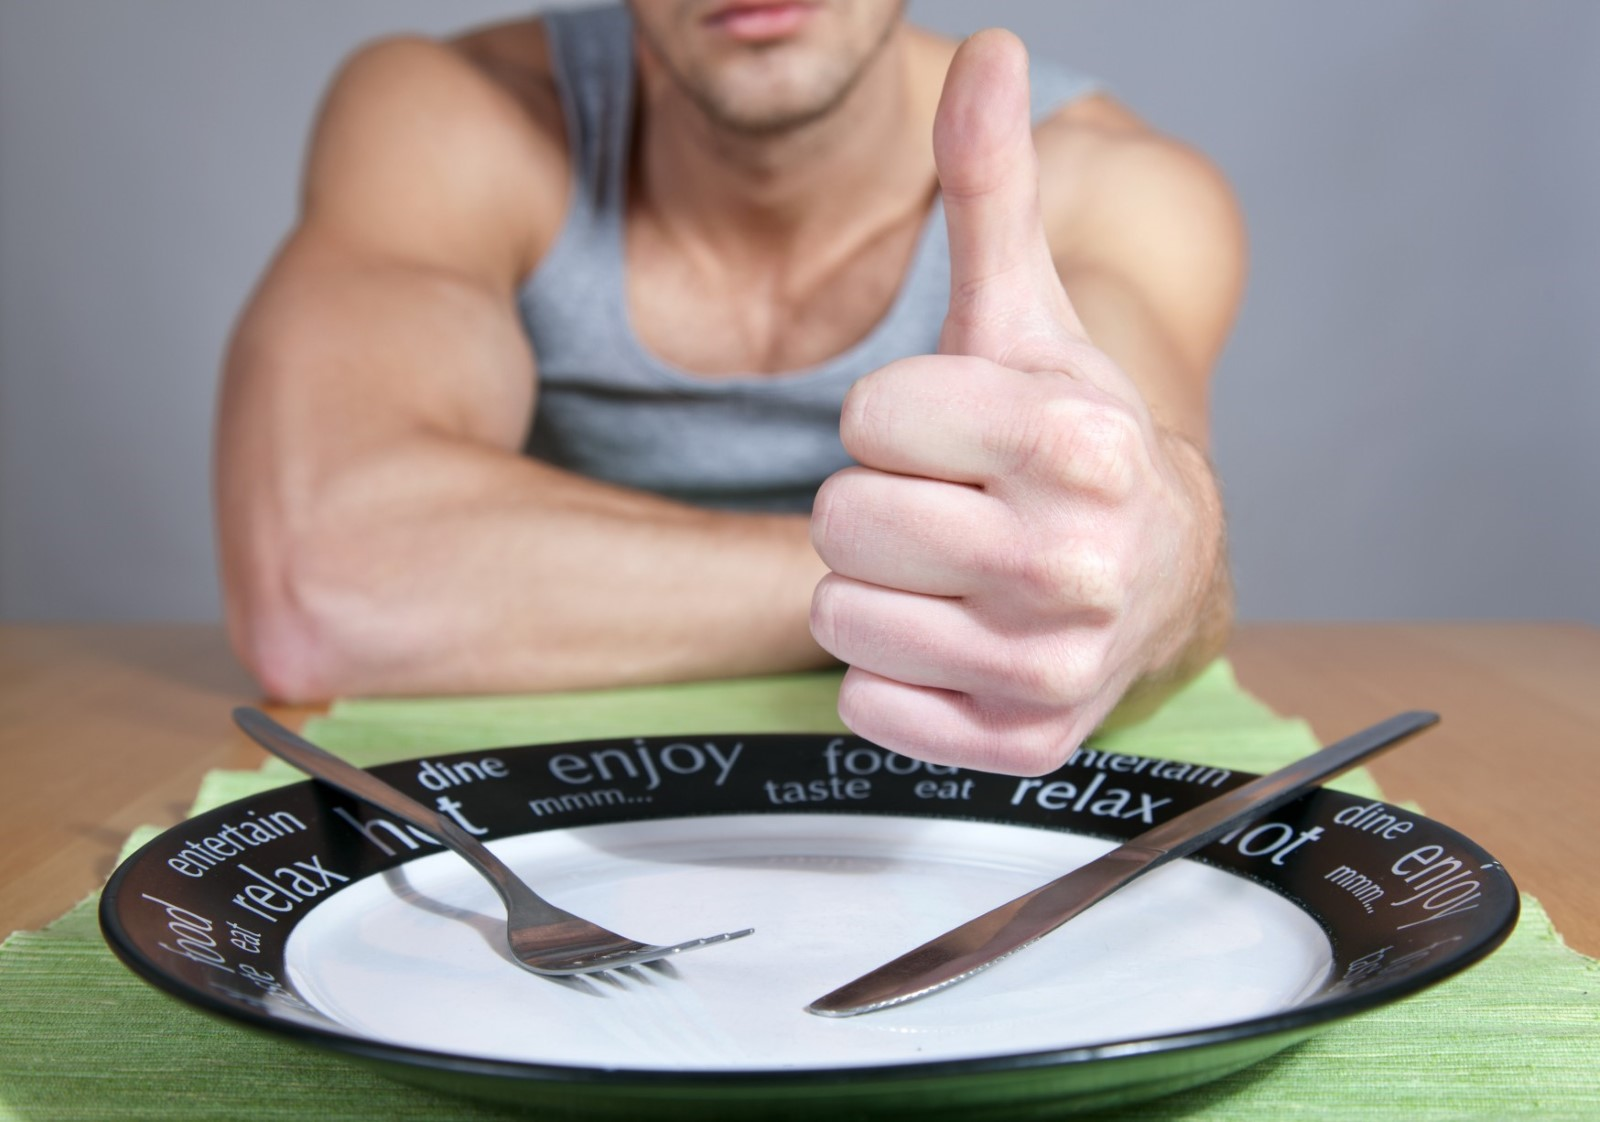 anoressia astenia improvvisa perdita di peso